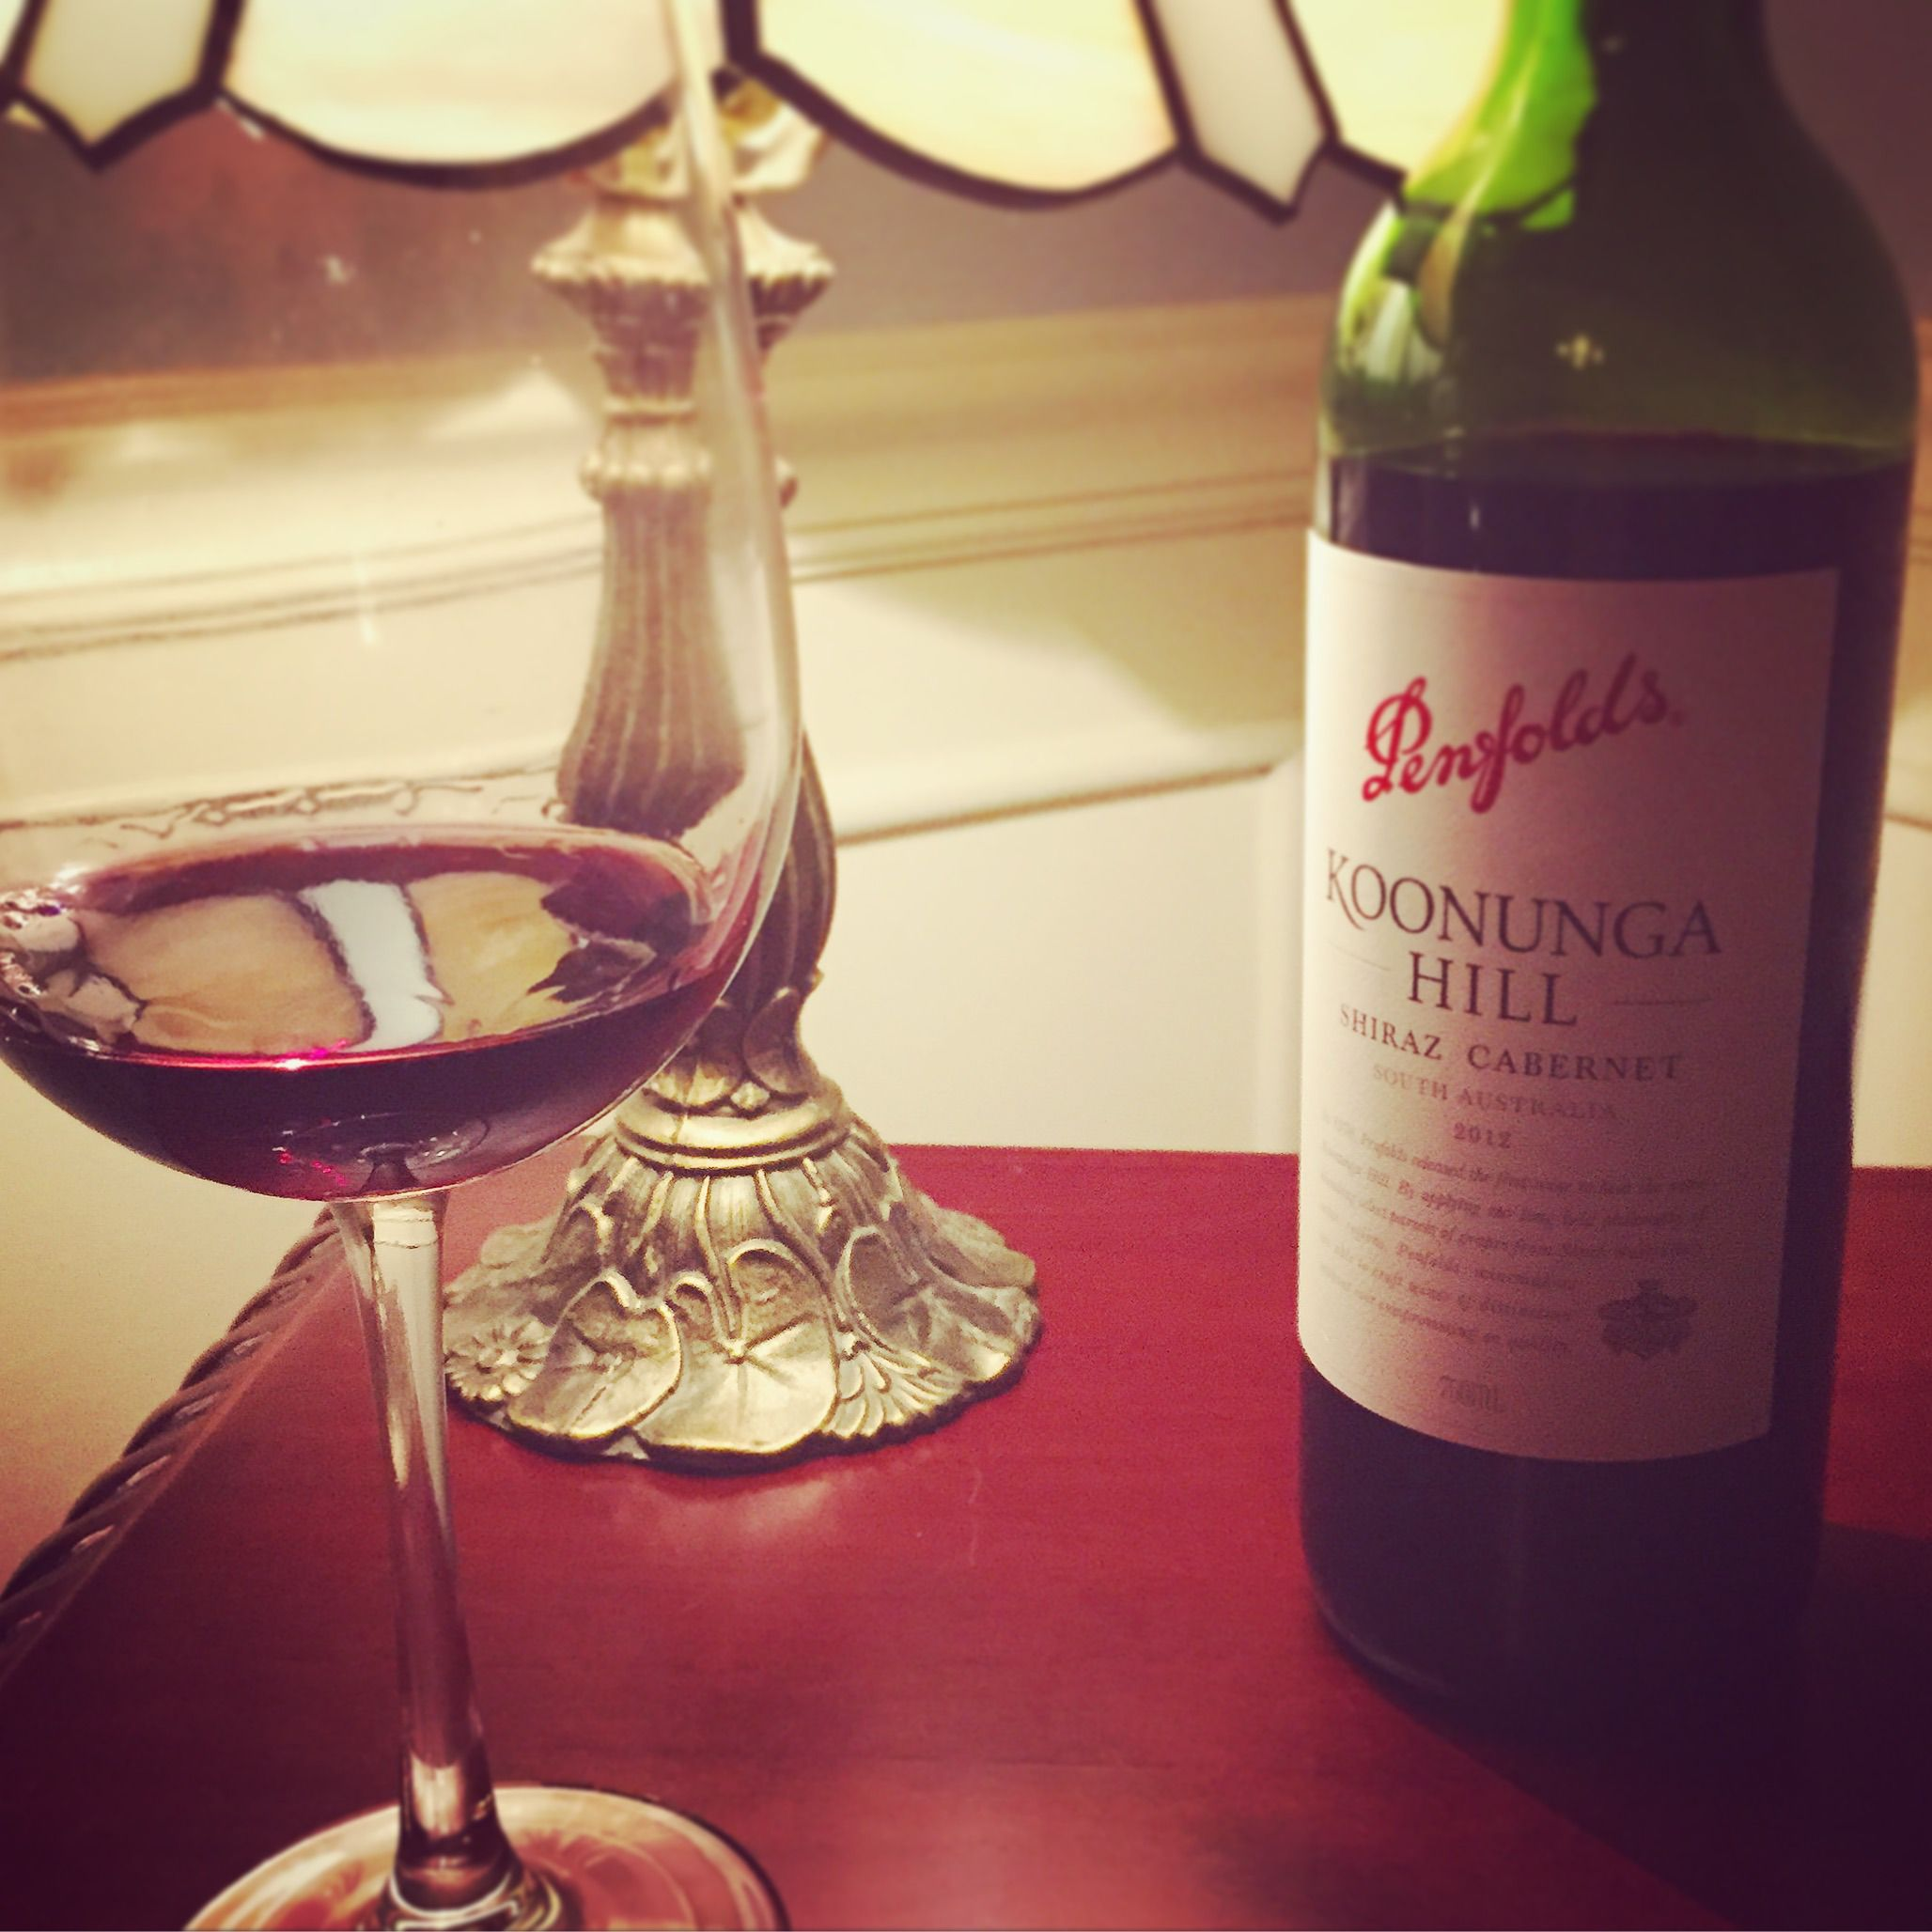 Wineesquire Wine Bottle Cabernet Wines